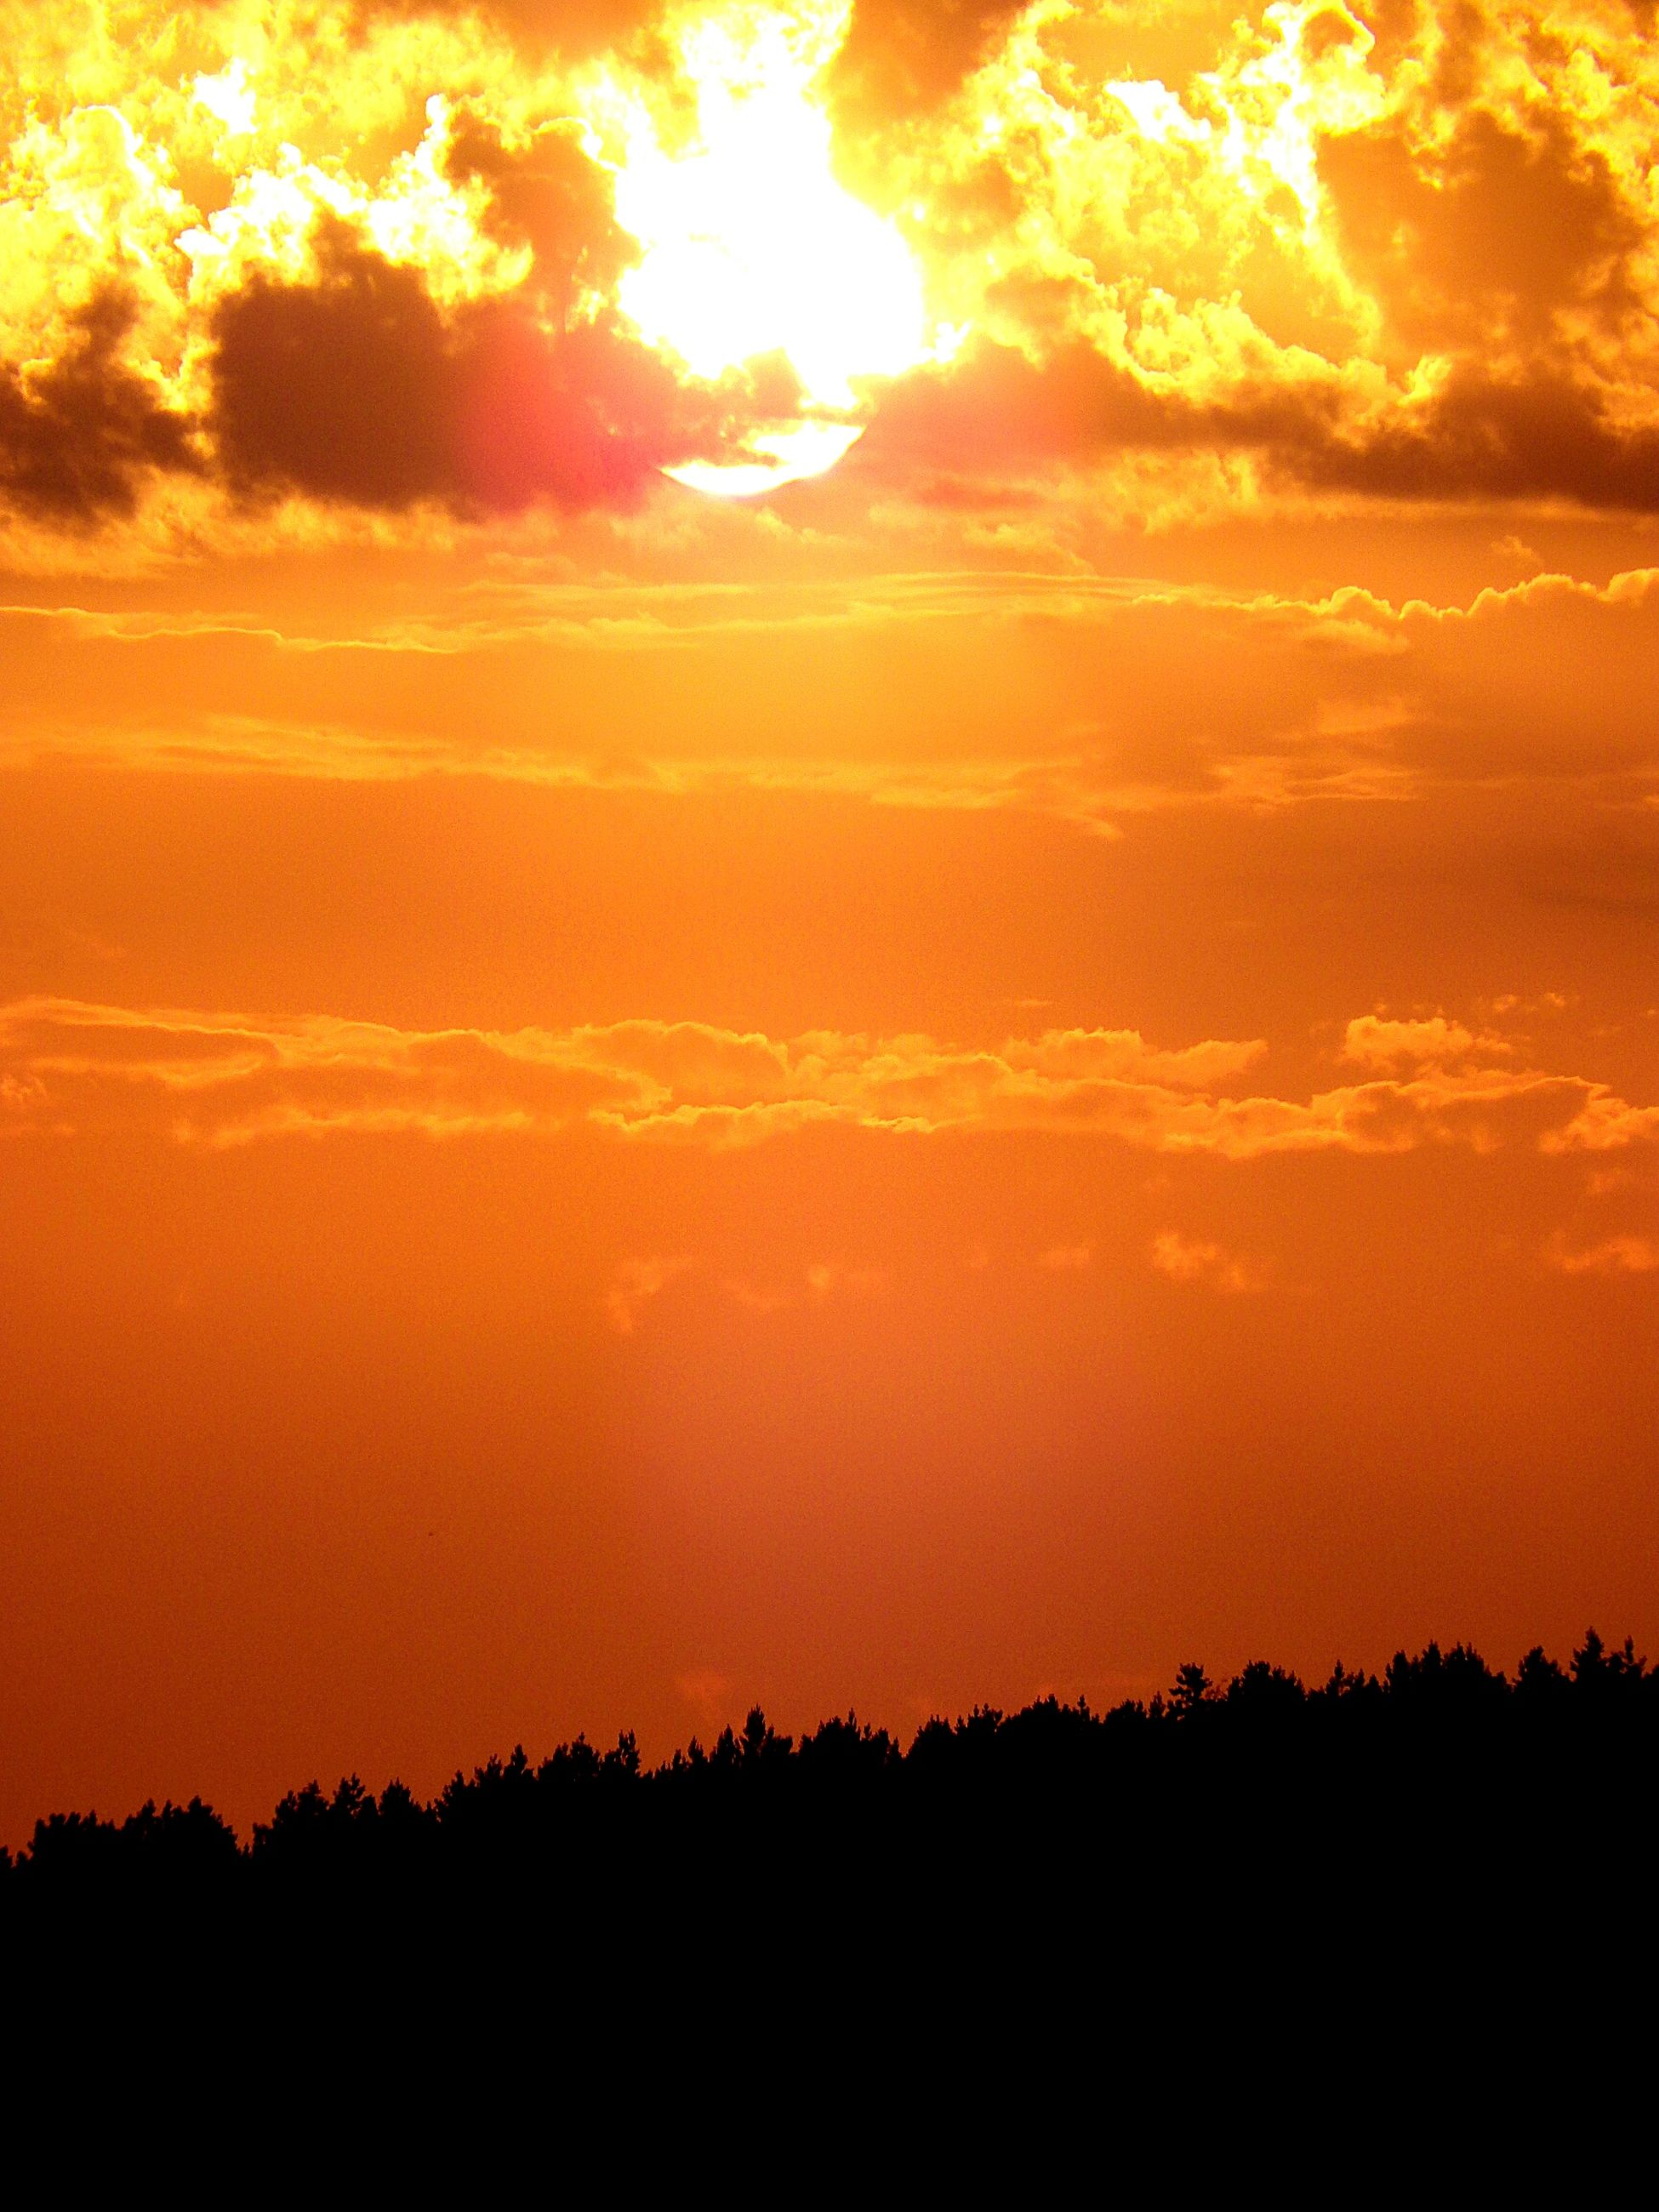 sunset, orange color, silhouette, scenics, beauty in nature, sky, tranquil scene, tranquility, idyllic, cloud - sky, nature, dramatic sky, landscape, sun, majestic, cloud, outdoors, no people, moody sky, cloudy